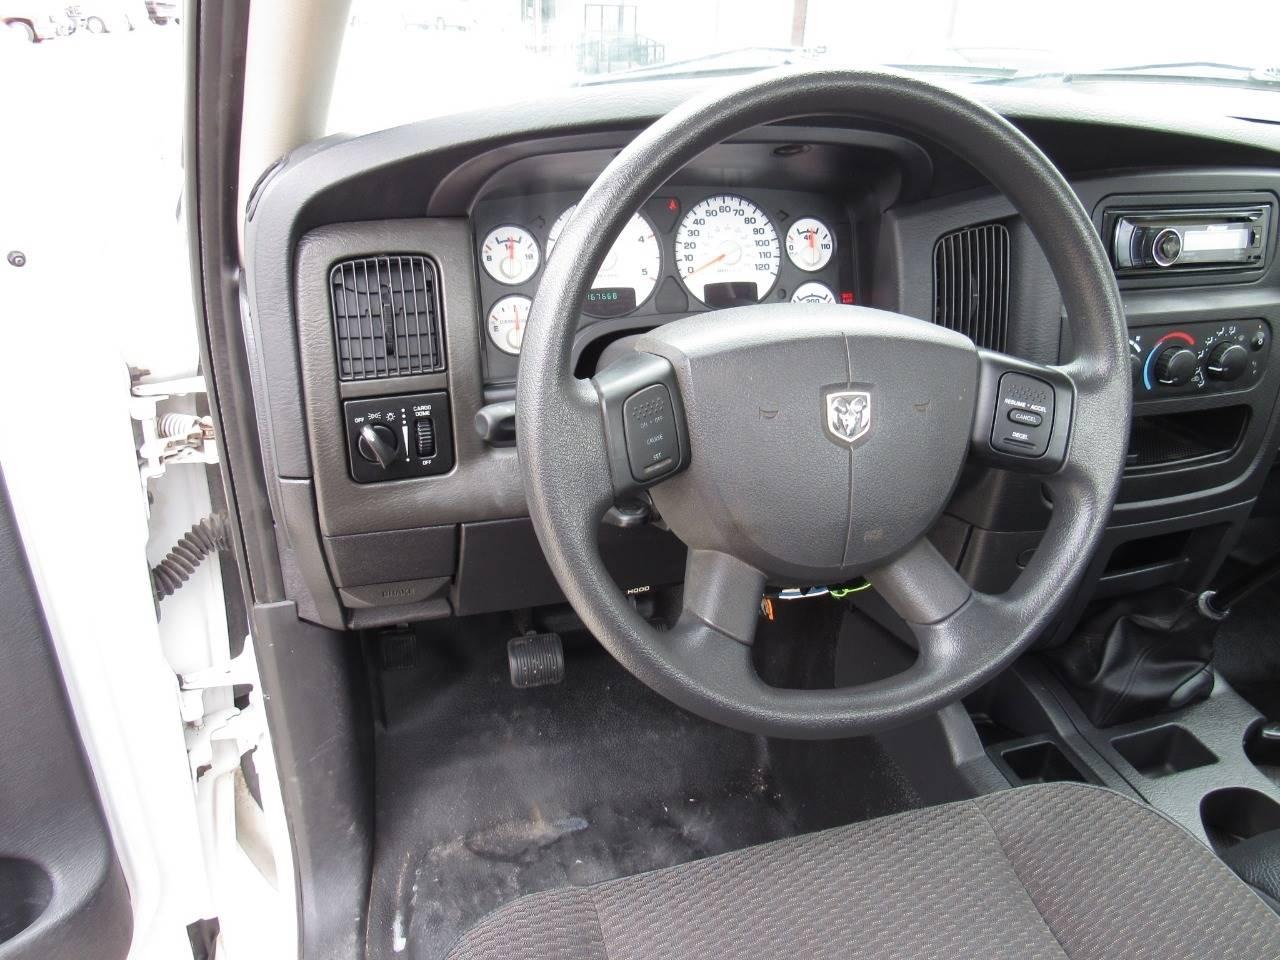 2005 Dodge Ram 2500